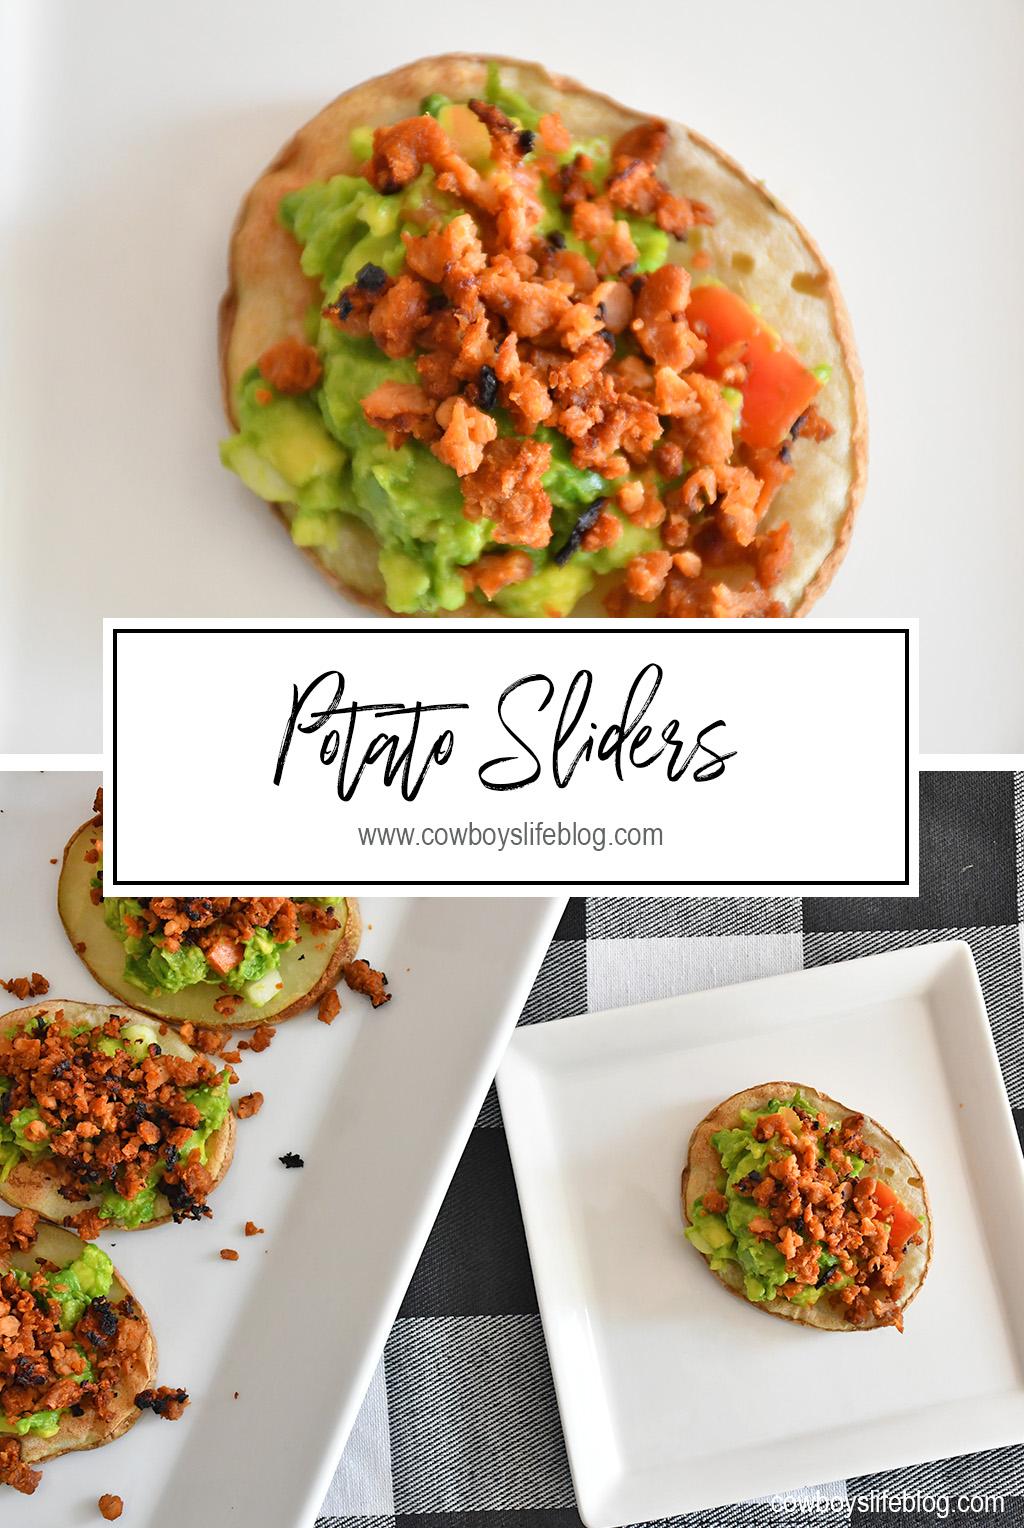 How to make Potato Guacamole Sliders